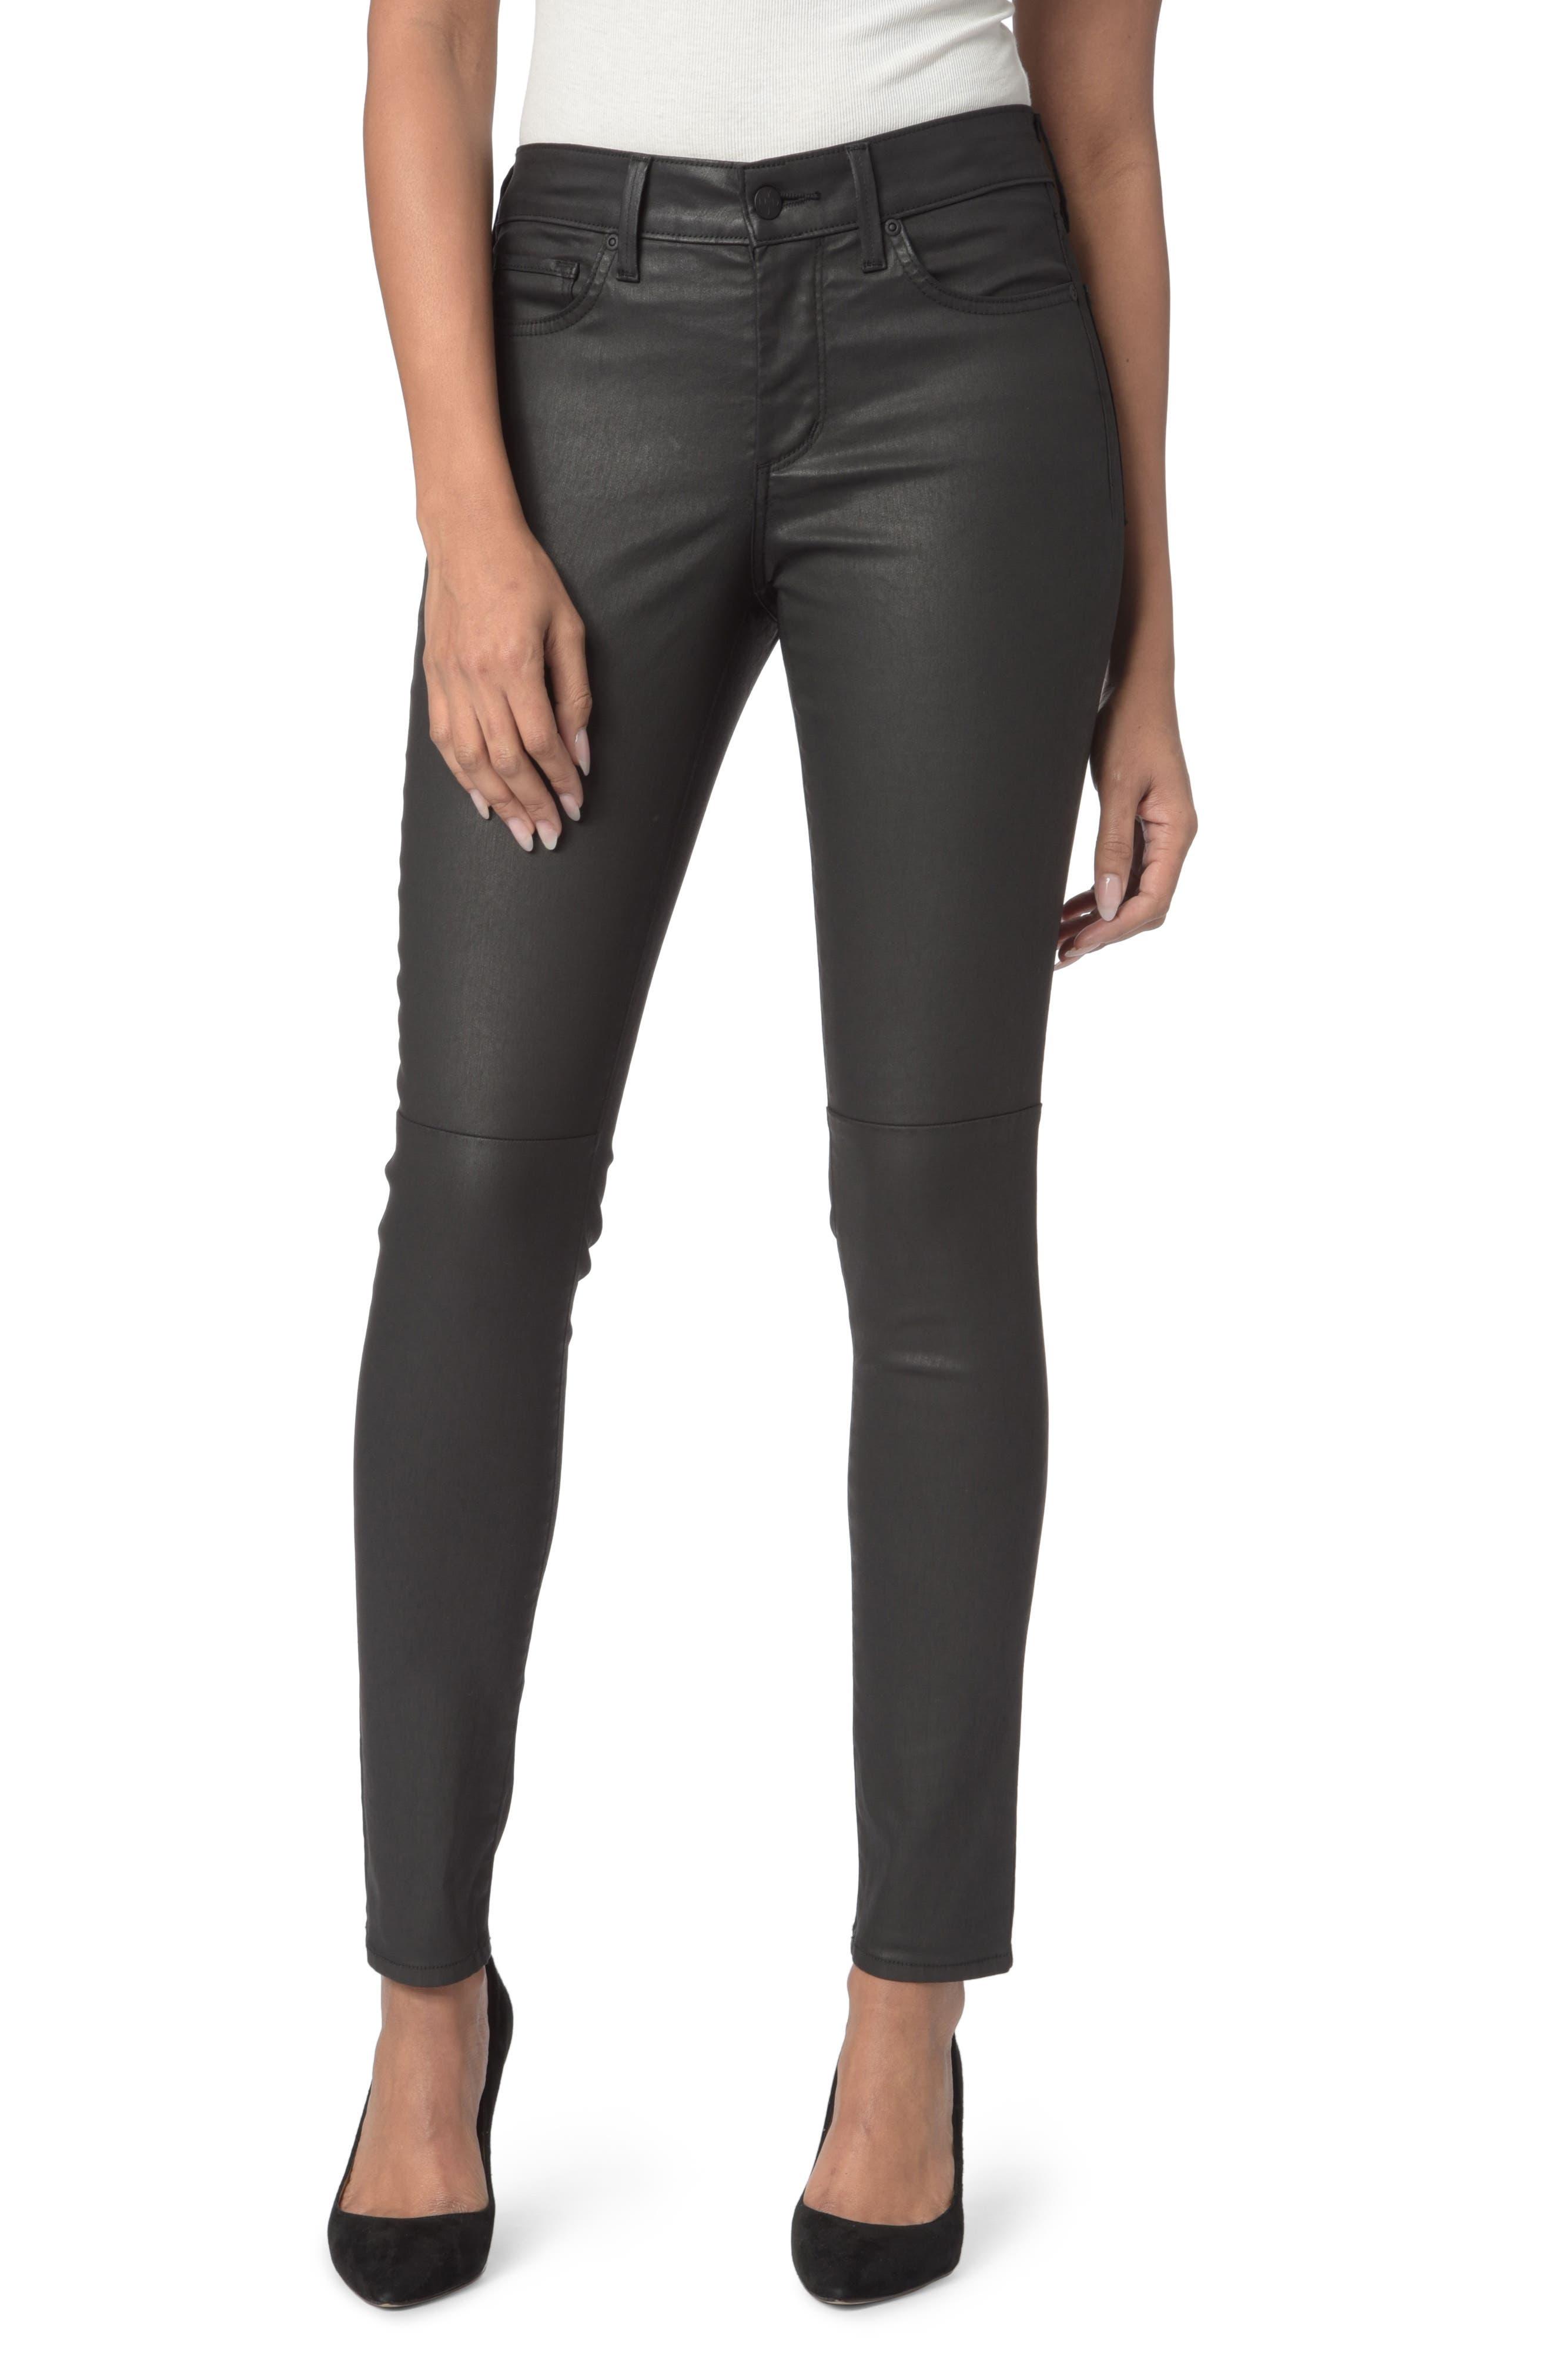 Main Image - NYDJ Coated Stretch Skinny Jeans (Regular & Petite)